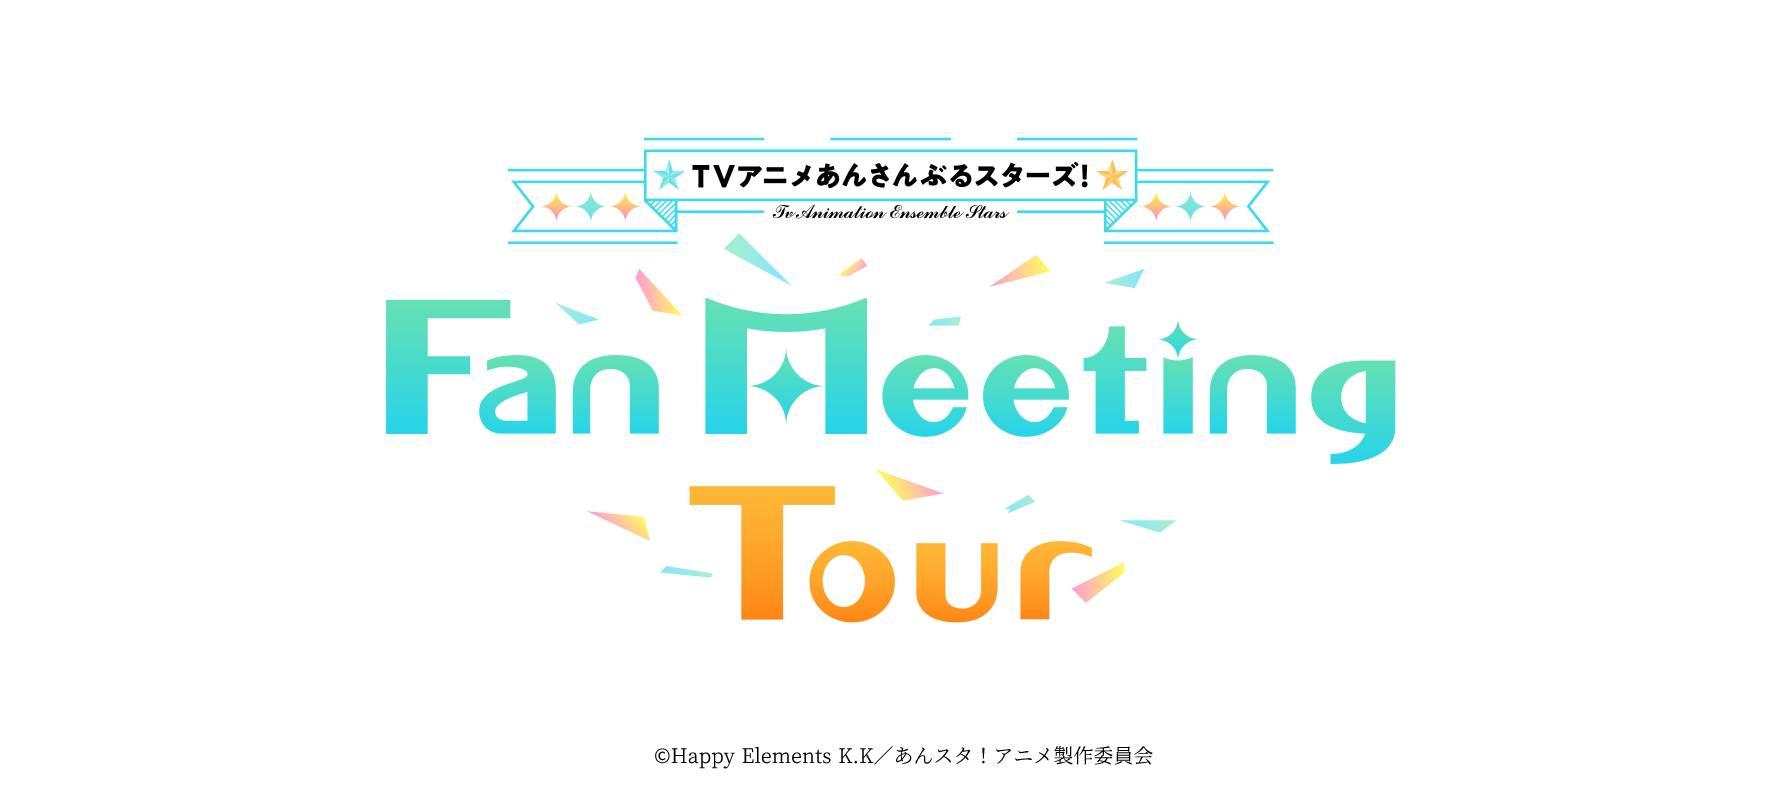 [Streaming+] TV Anime ENSEMBLE STARS! Fan Meeting Tour